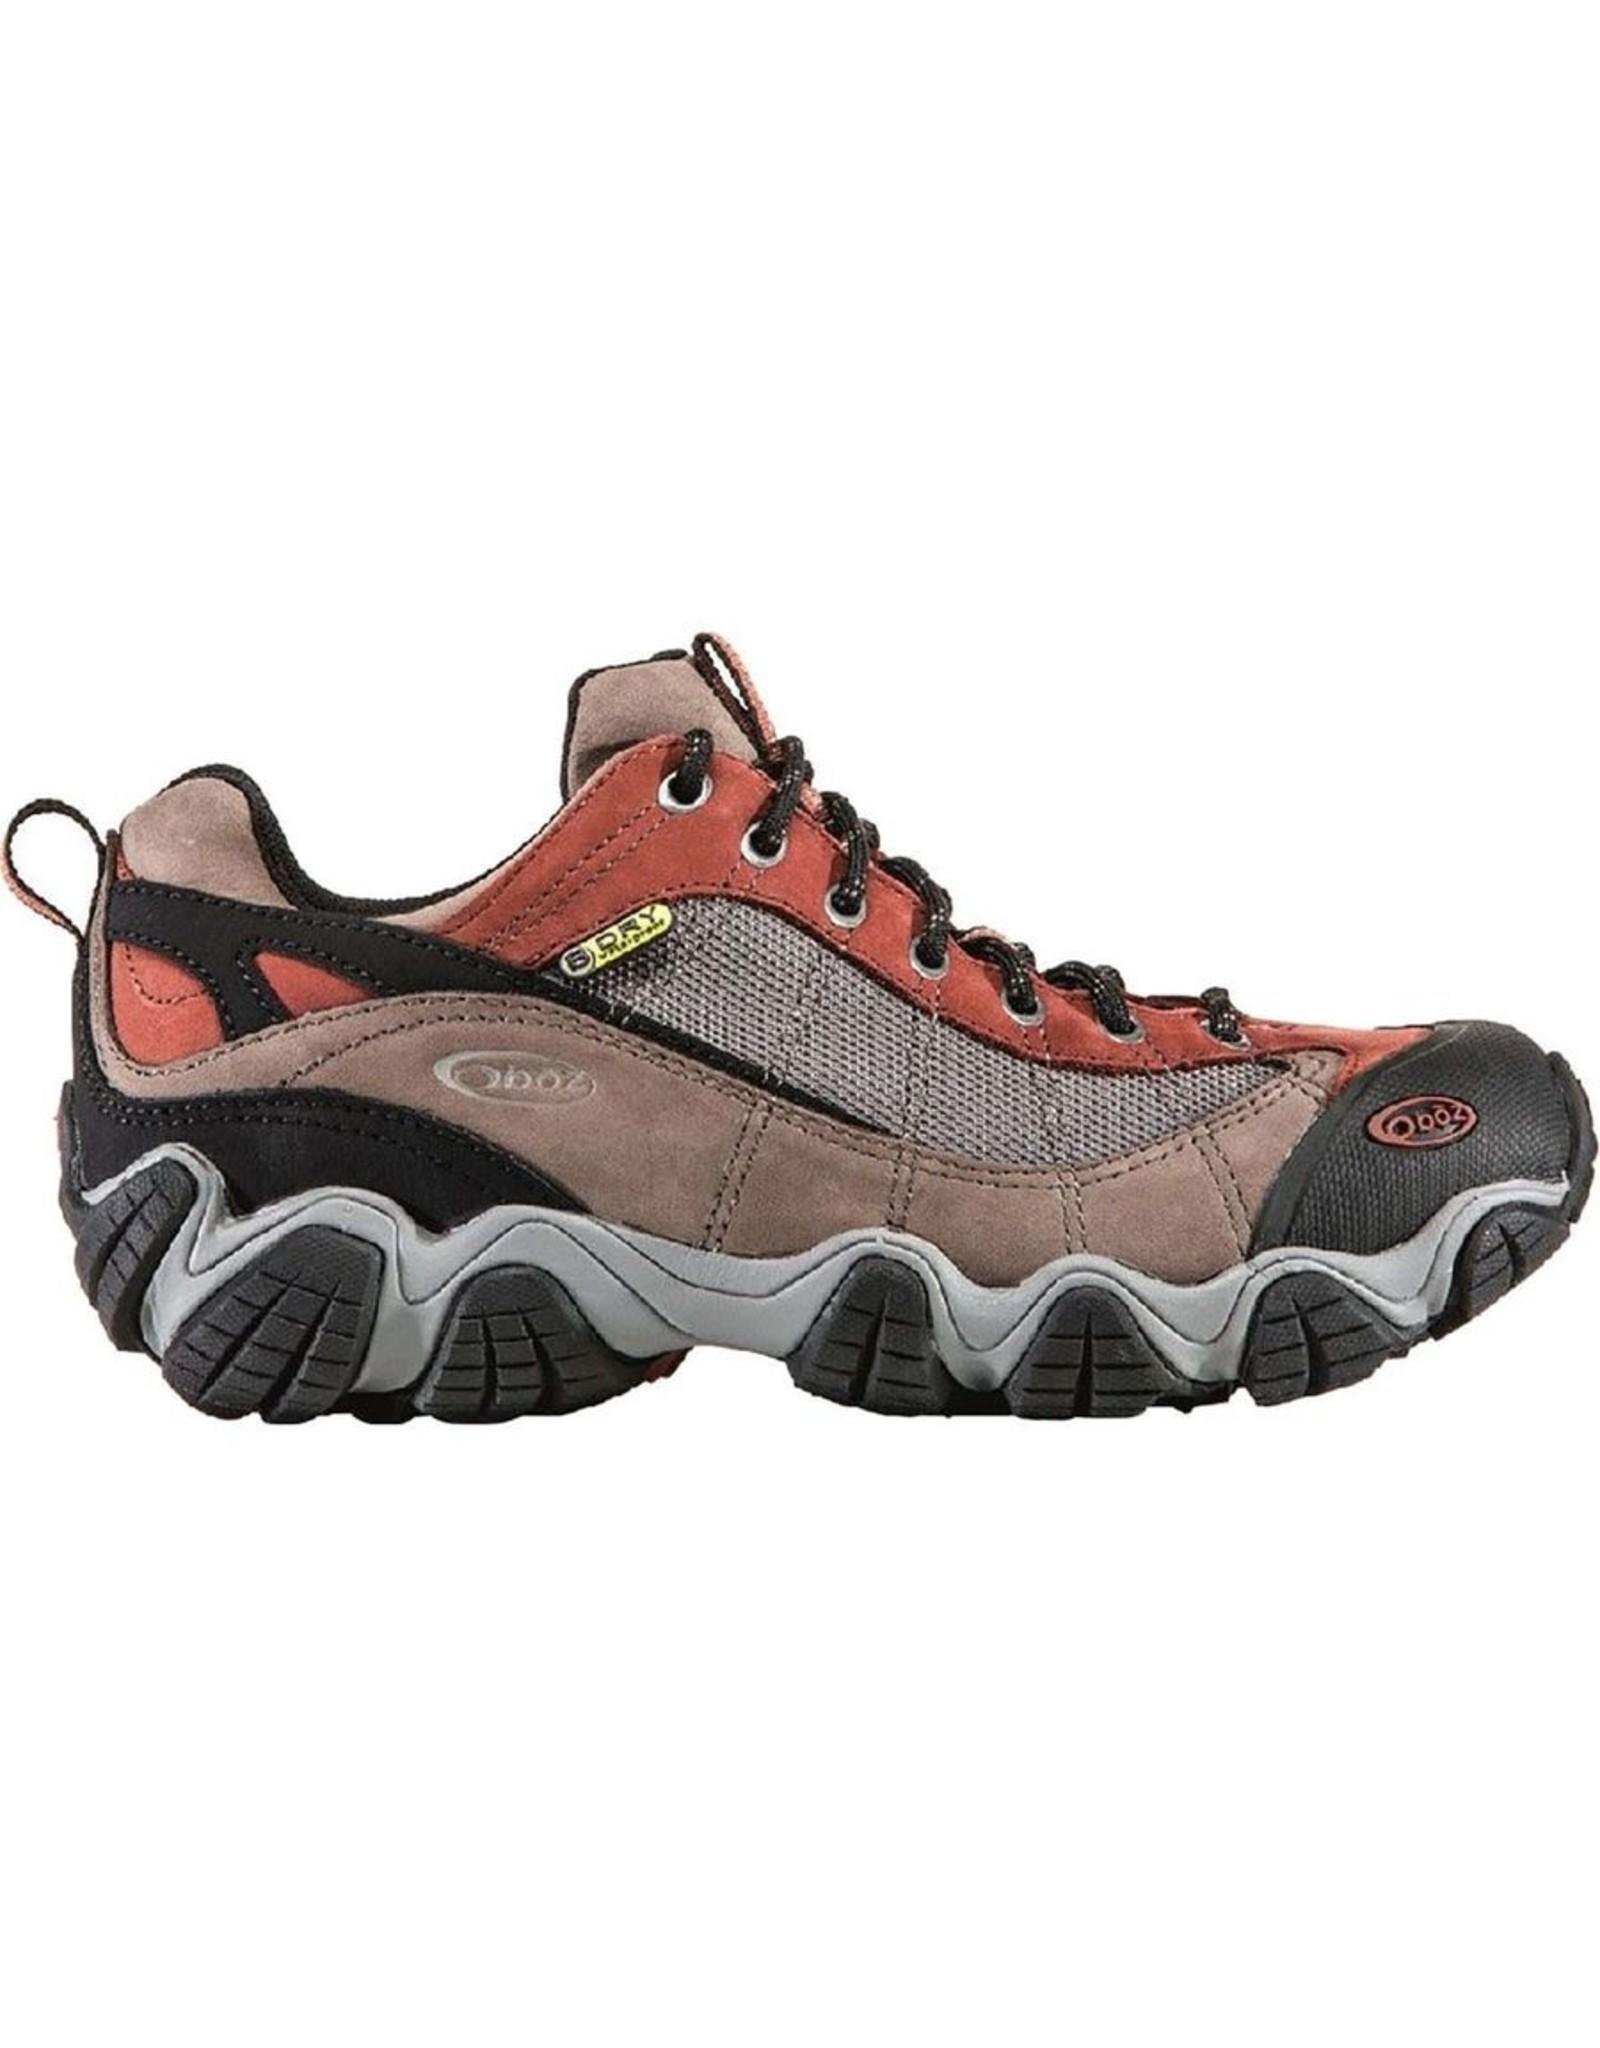 Oboz Oboz Men's Firebrand II Low BDry Shoe, Earth, 9